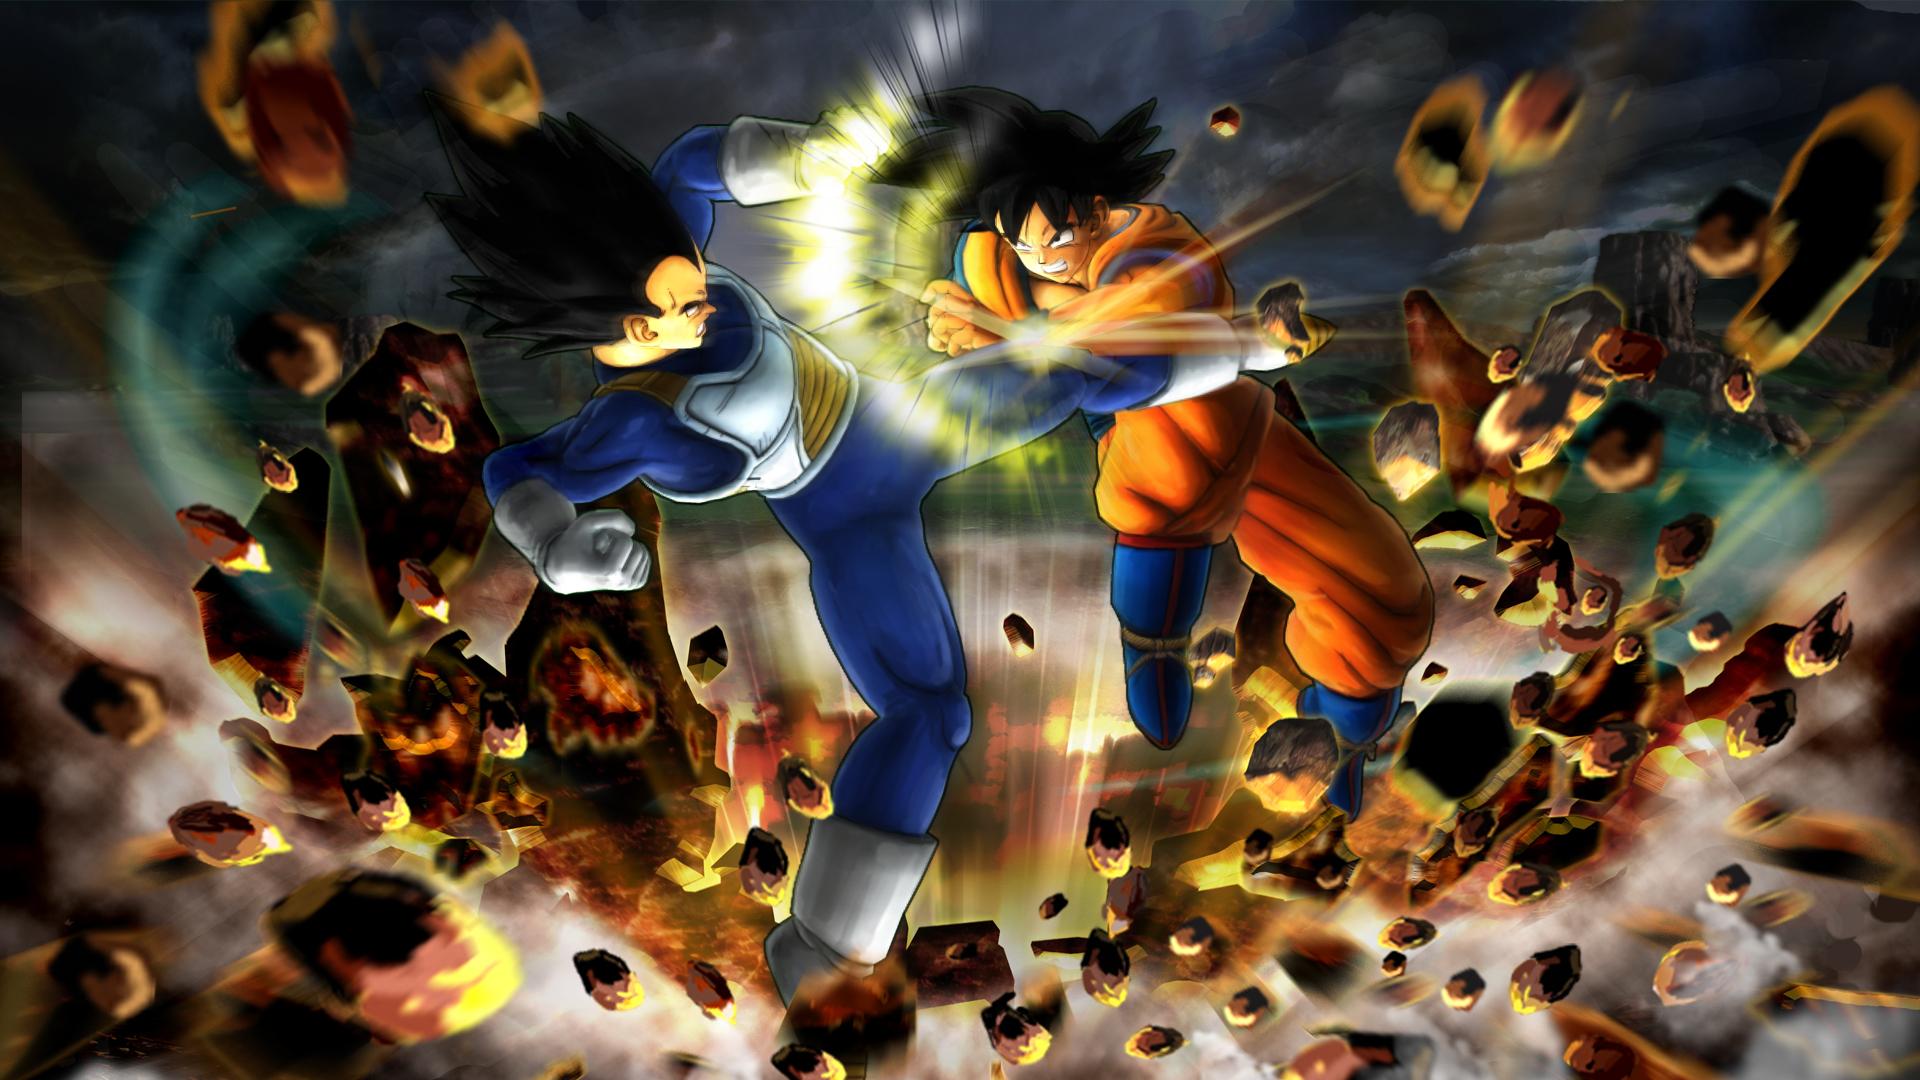 3D Fight Wallpaper  Dragon Ball Z Wallpapers HD Anime